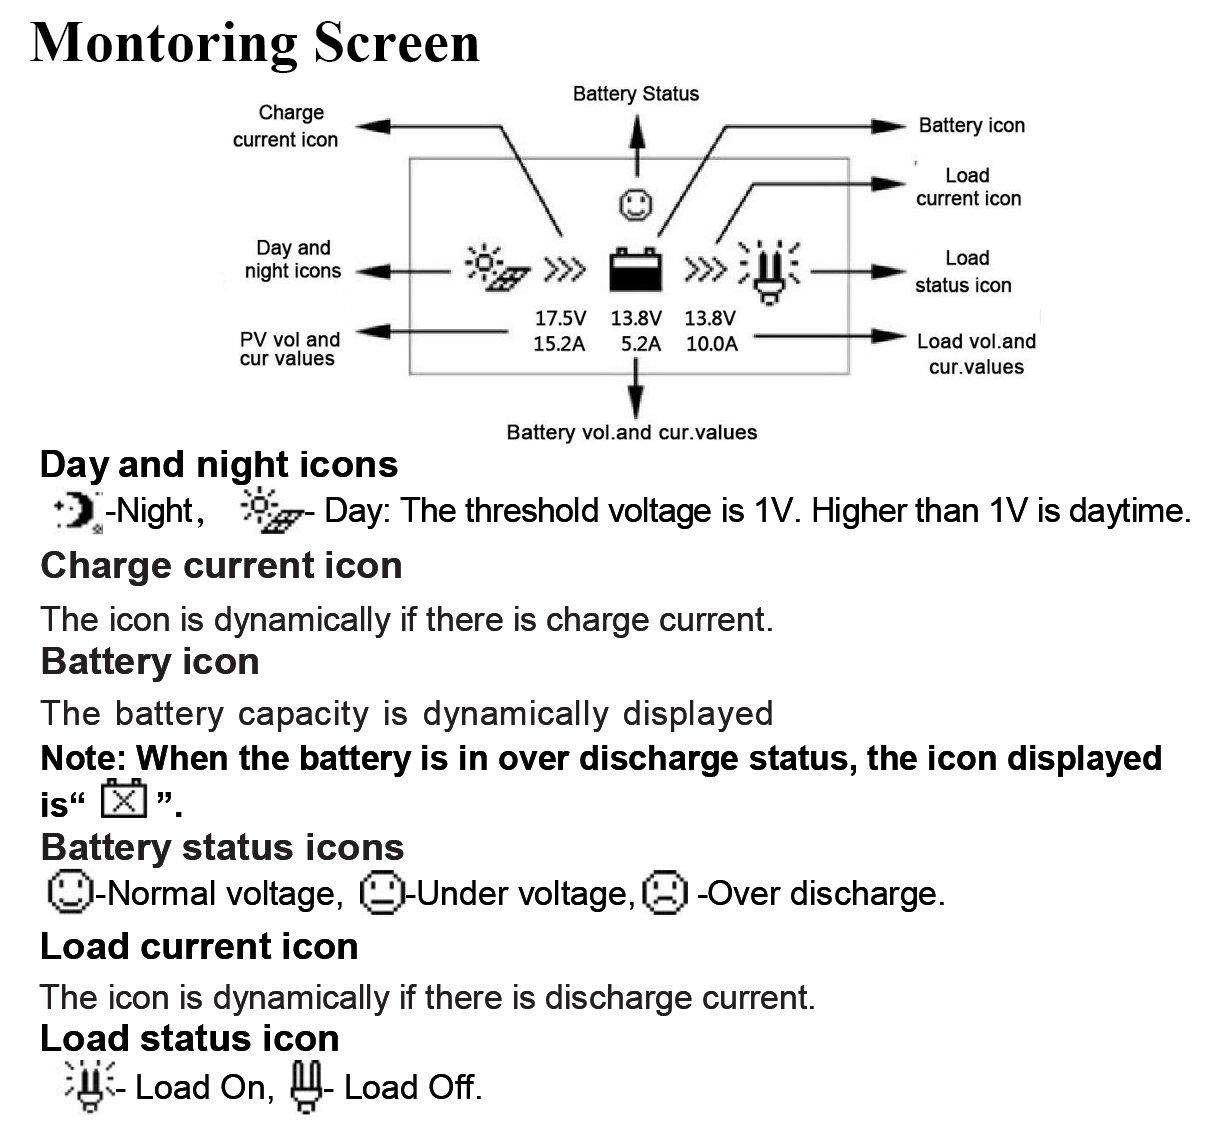 20 A 40 A 12-24/CC regolatore di carica solare MPPT di 10/A identifica automaticamente il sistema di tensione Qaurora serie A 30 A